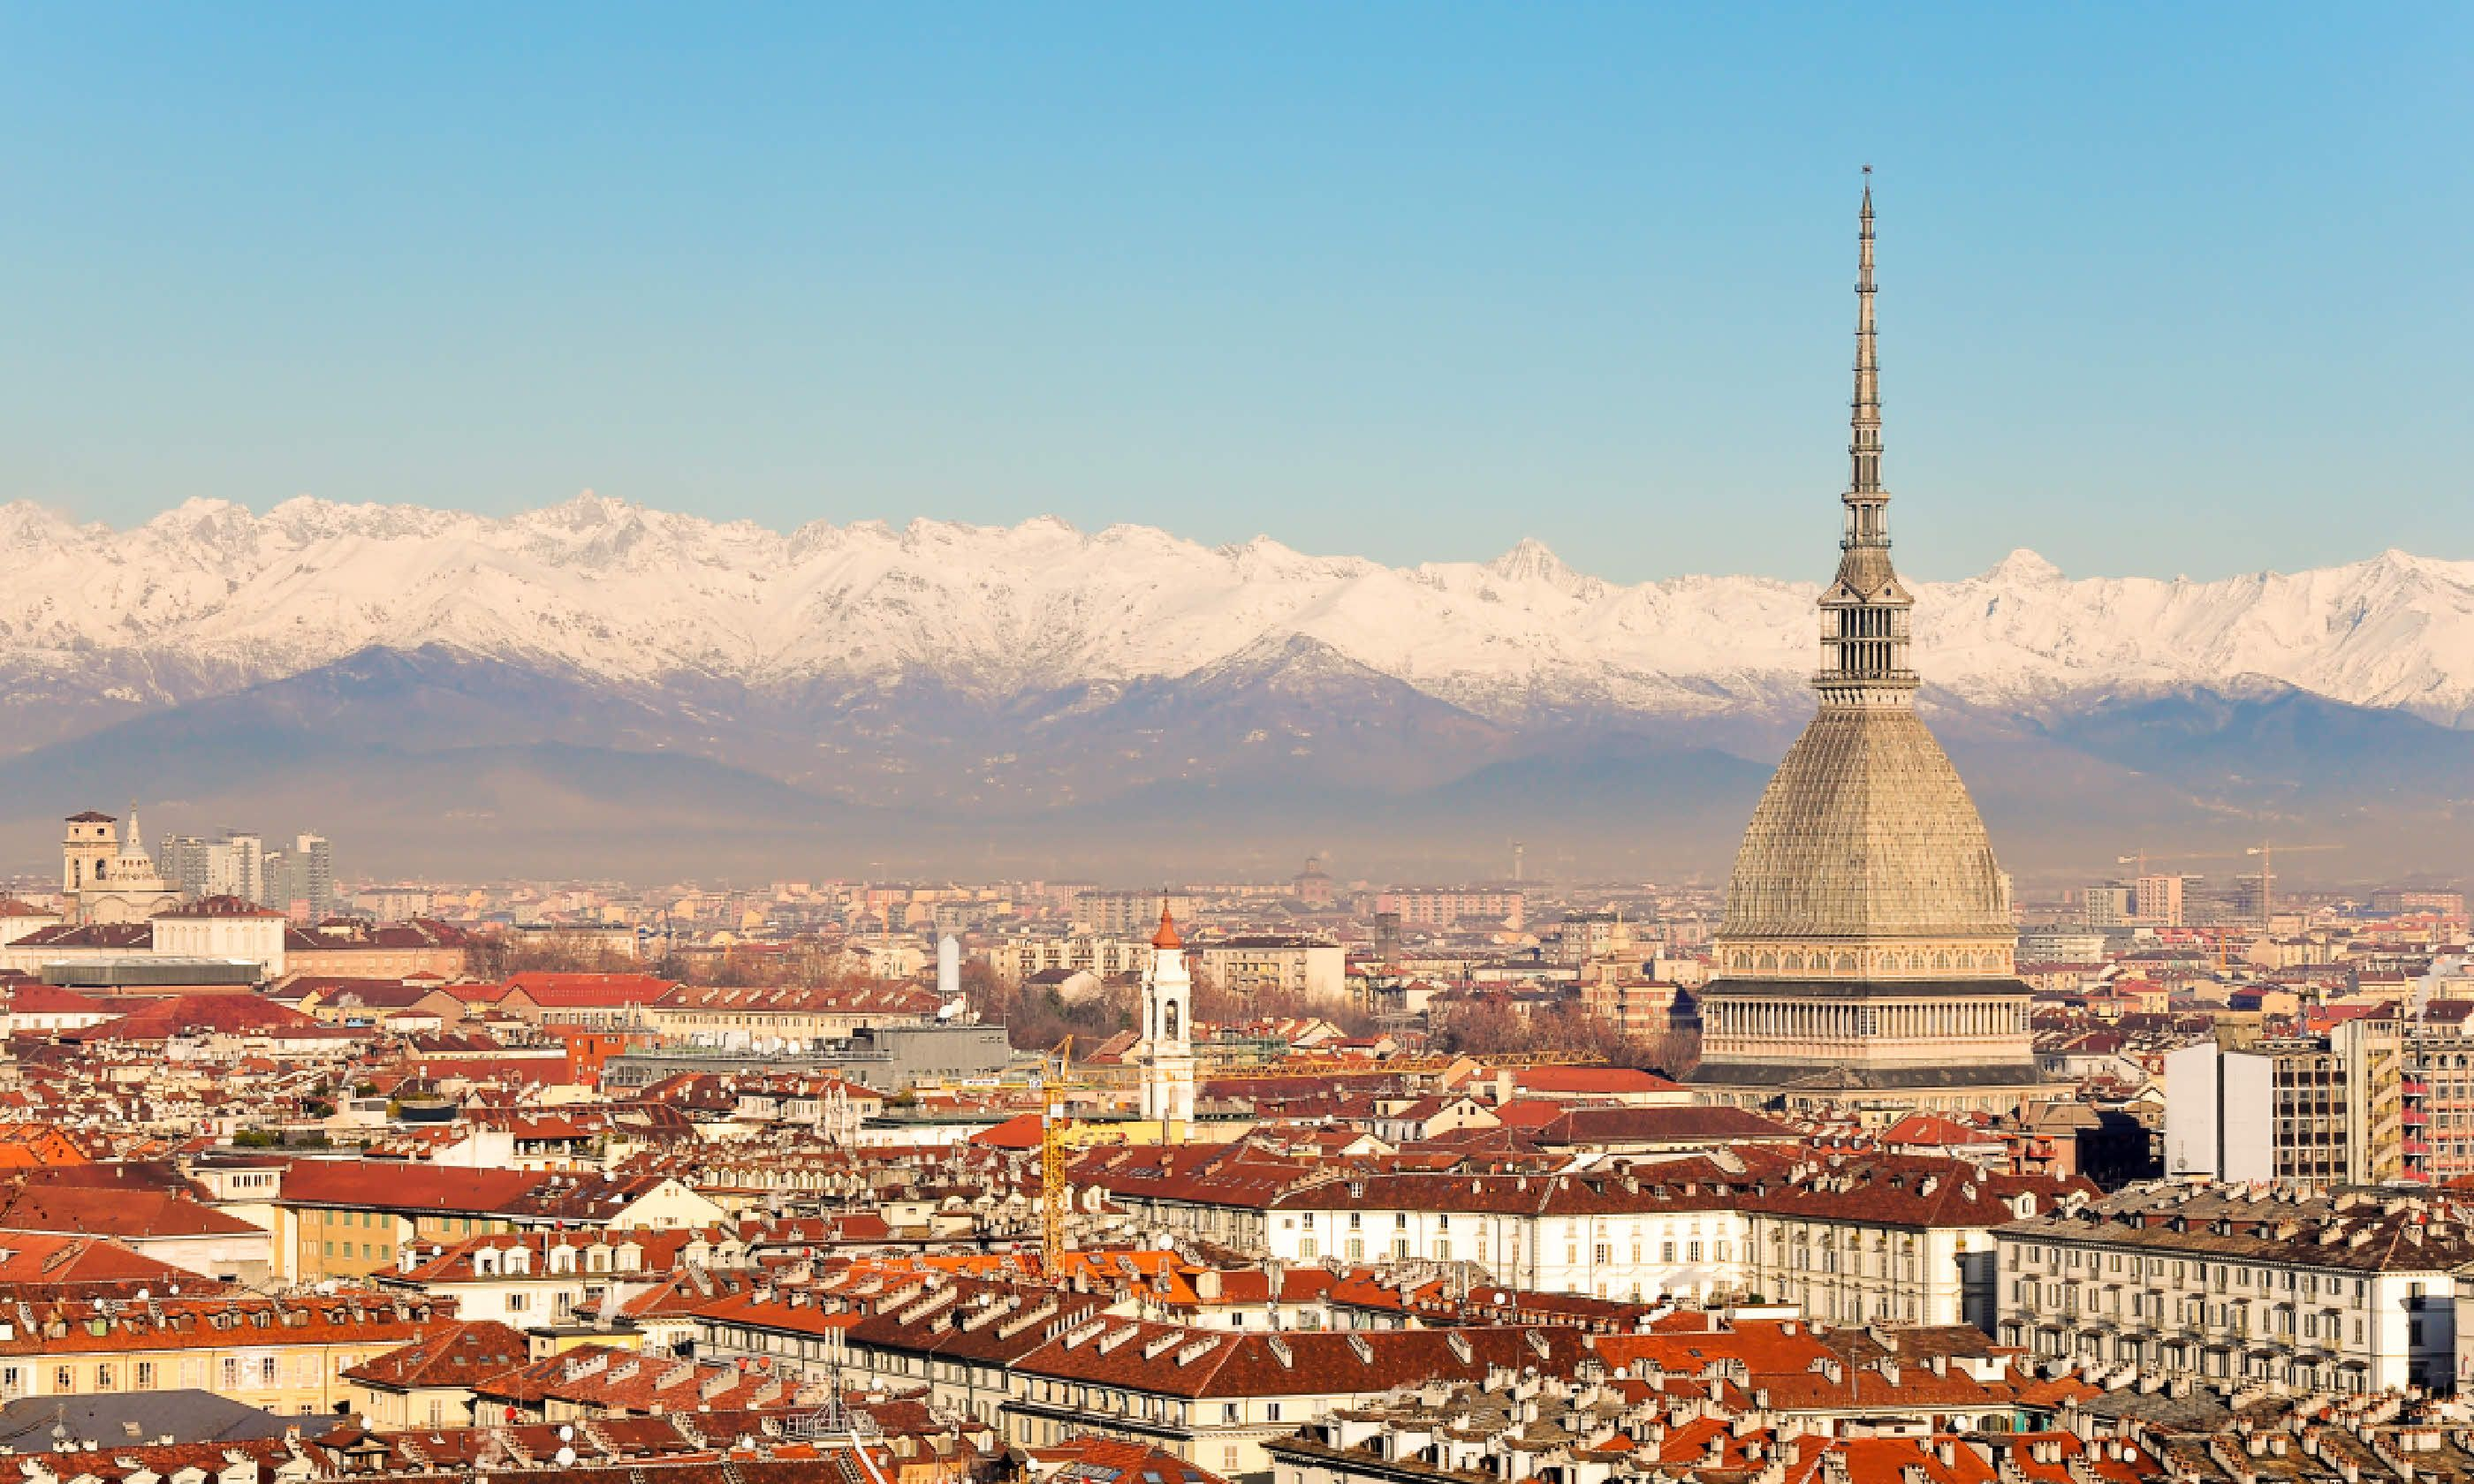 The National Museum of Cinema dominates Turin's skyline (Shutterstock)